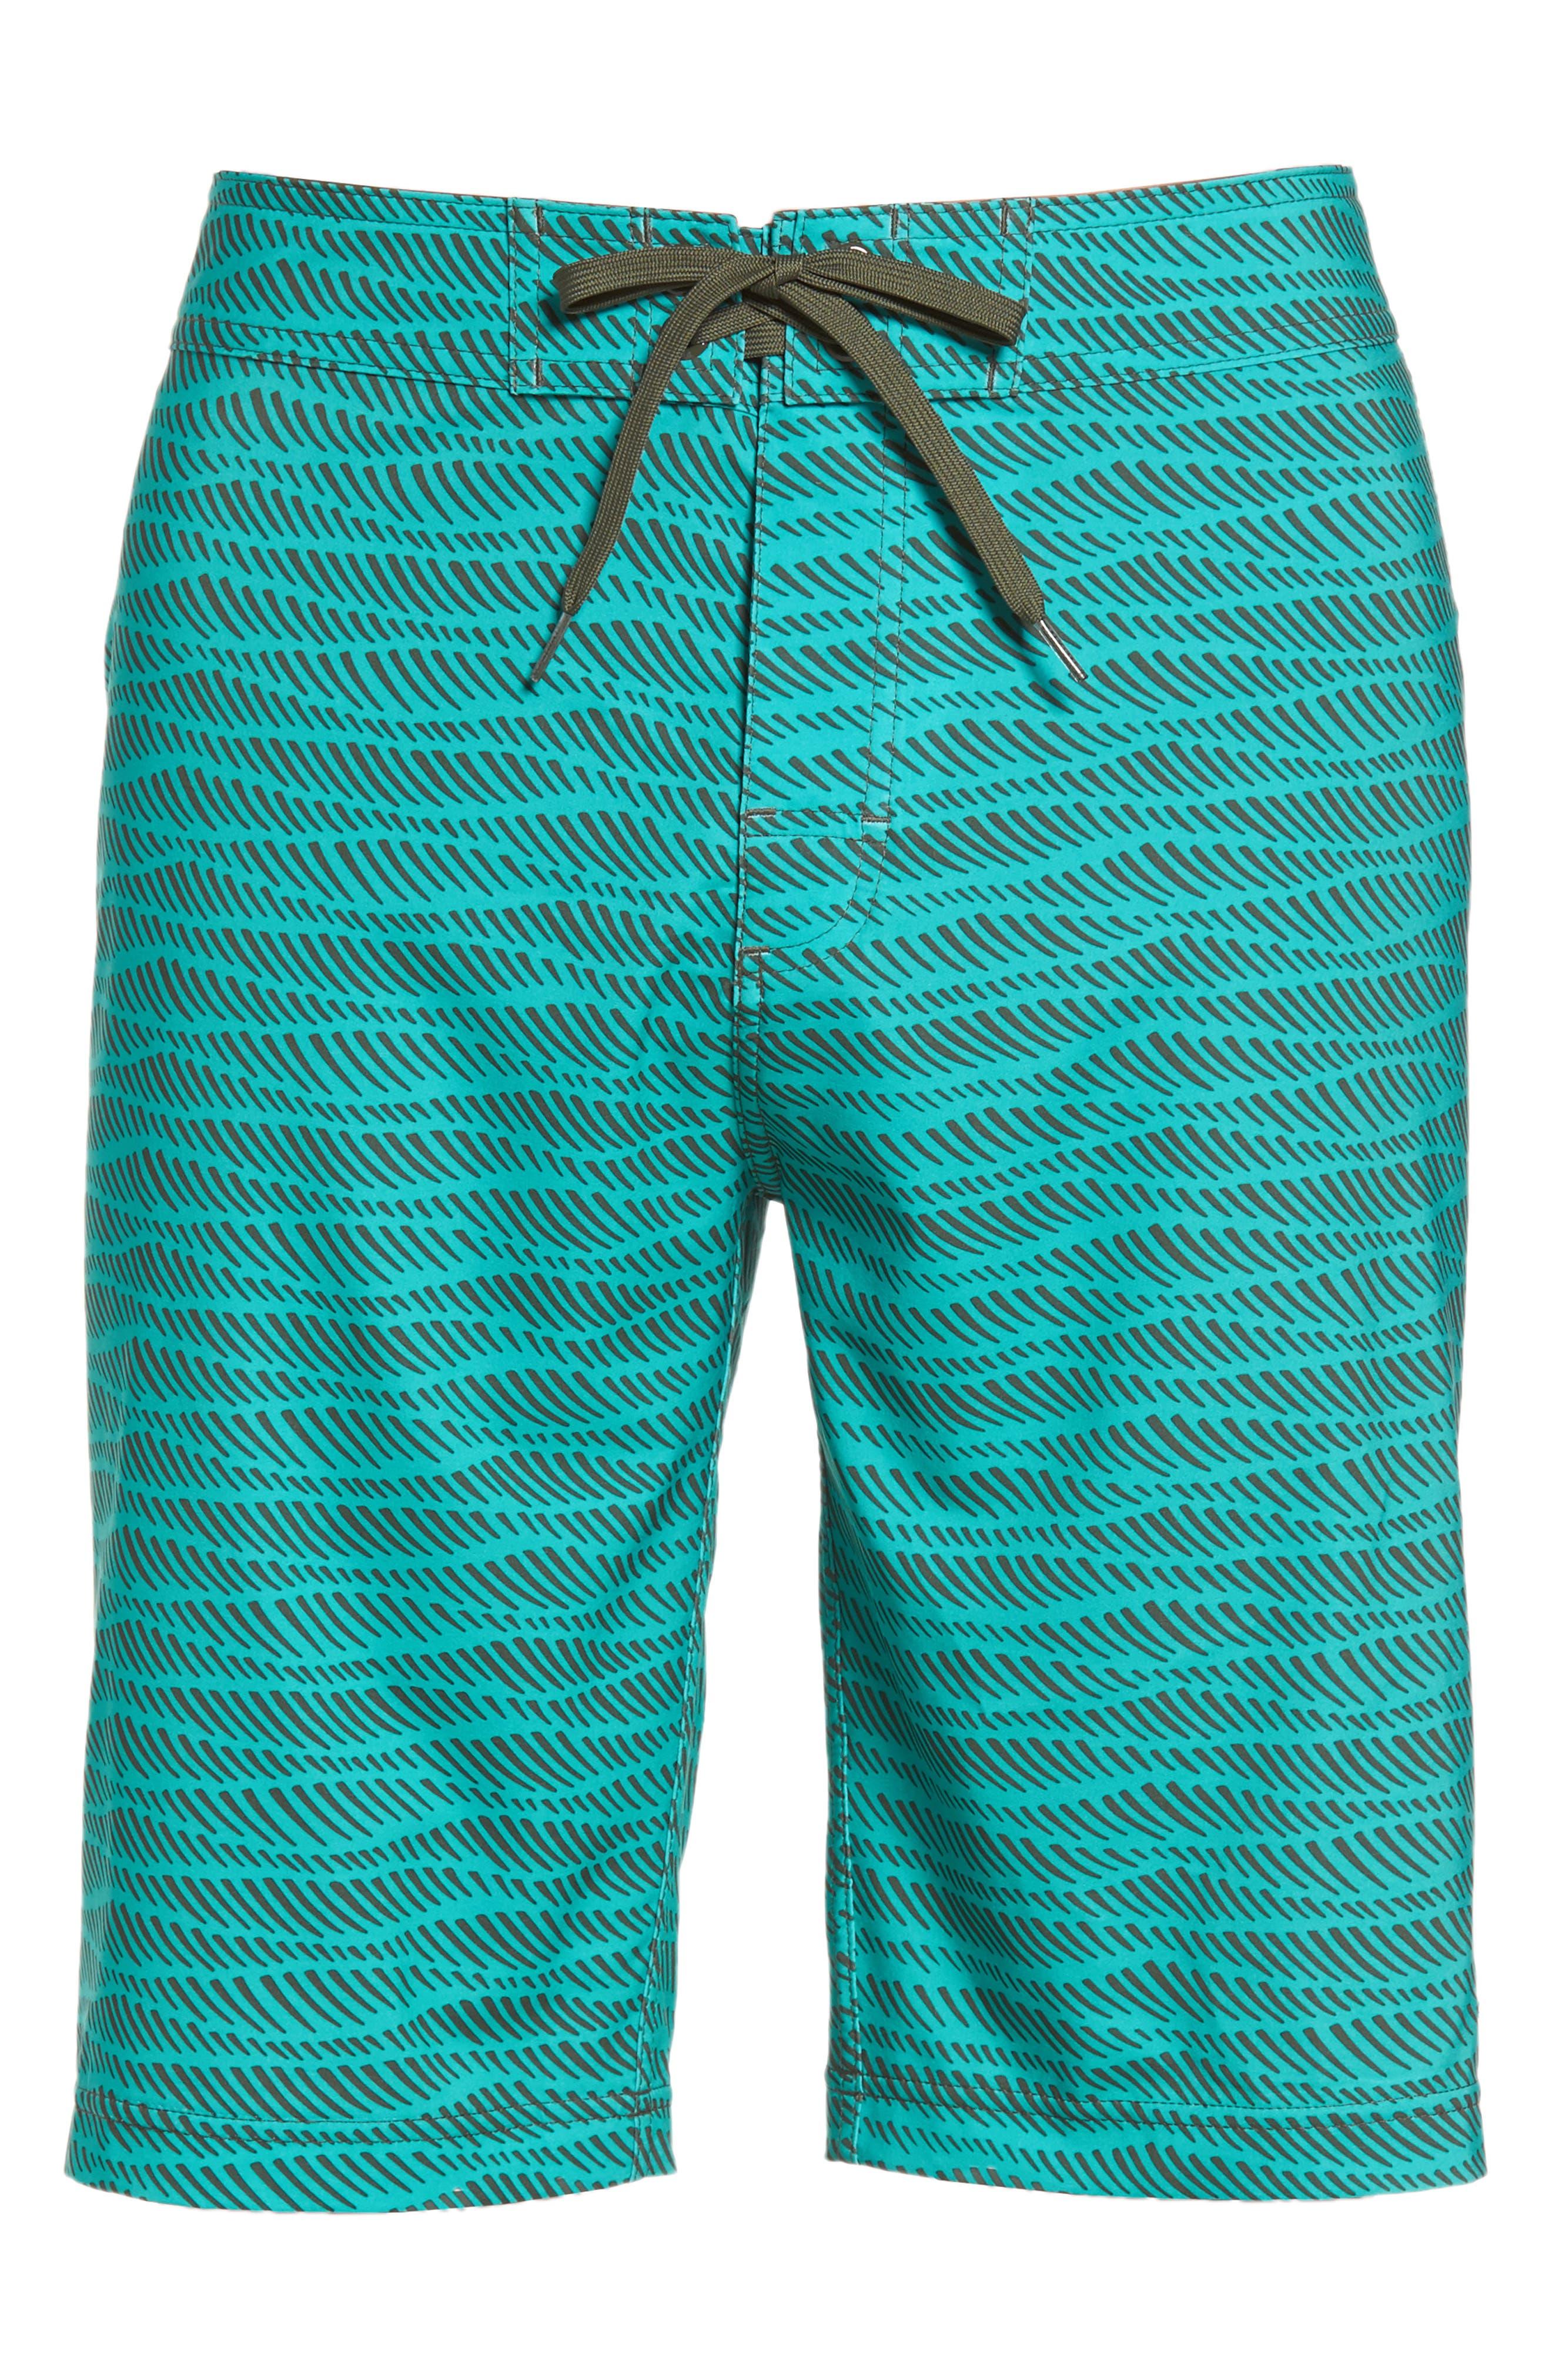 'Sediment' Stretch Board Shorts,                             Alternate thumbnail 81, color,